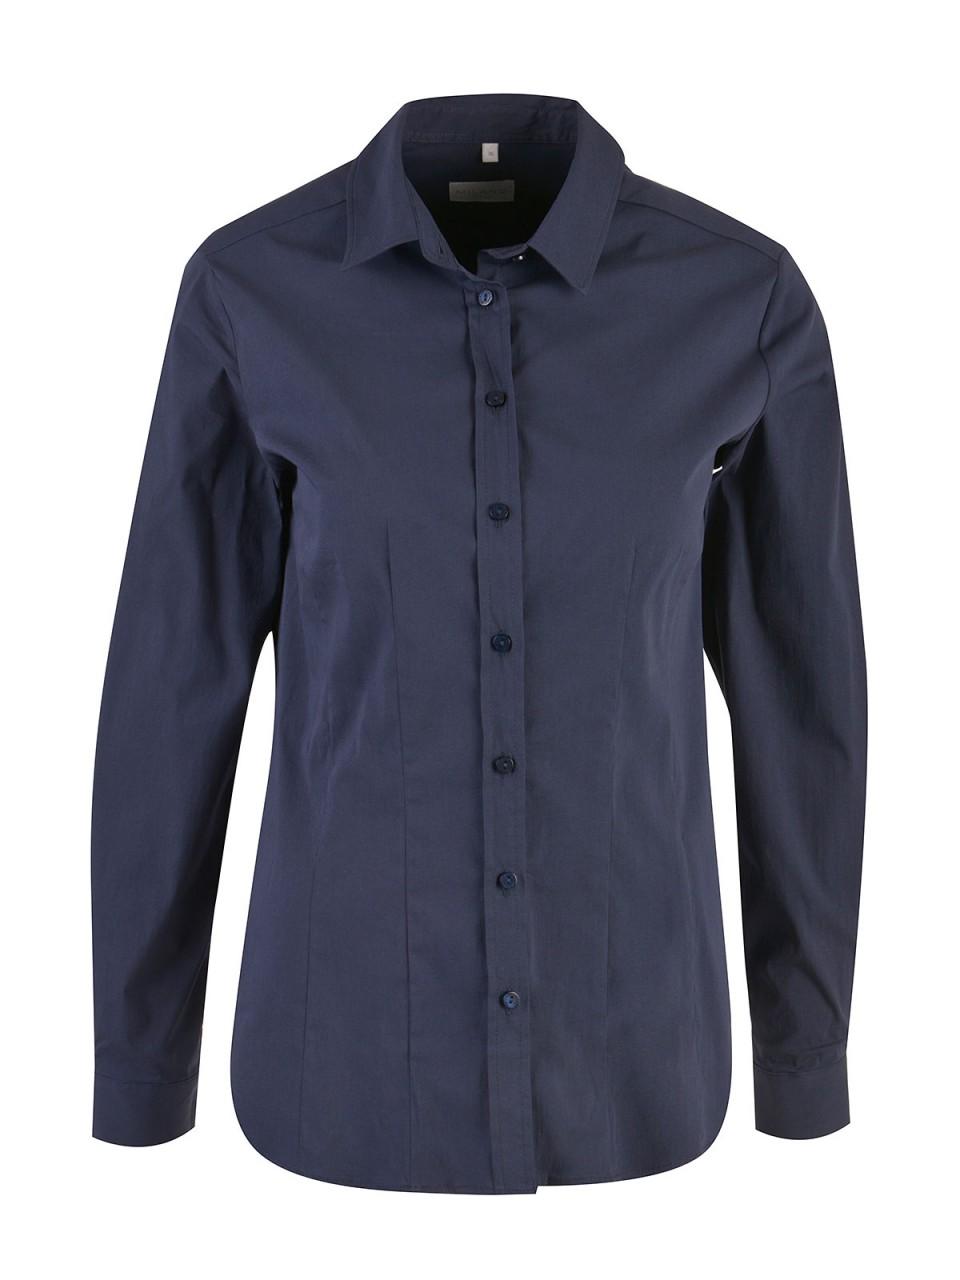 Oberteile - MILANO ITALY Damen Bluse, dunkelblau  - Onlineshop Designermode.com